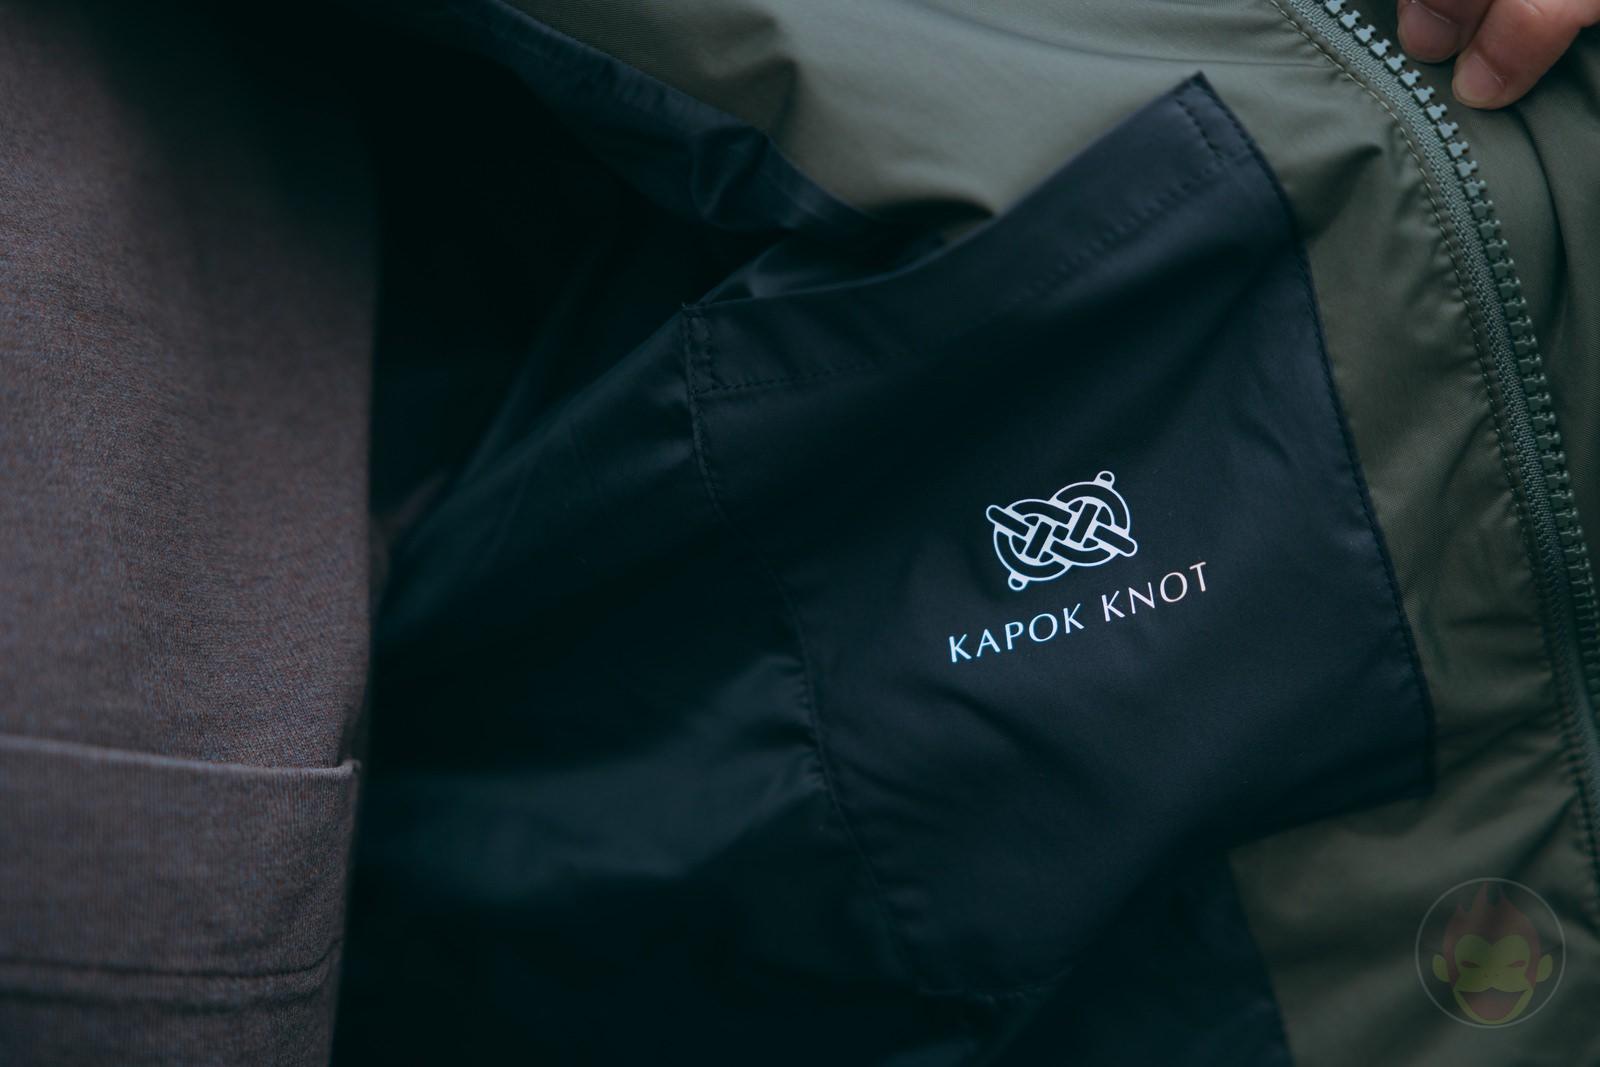 Kapok-Knot-Air-Light-Jacket-Review-06.jpg